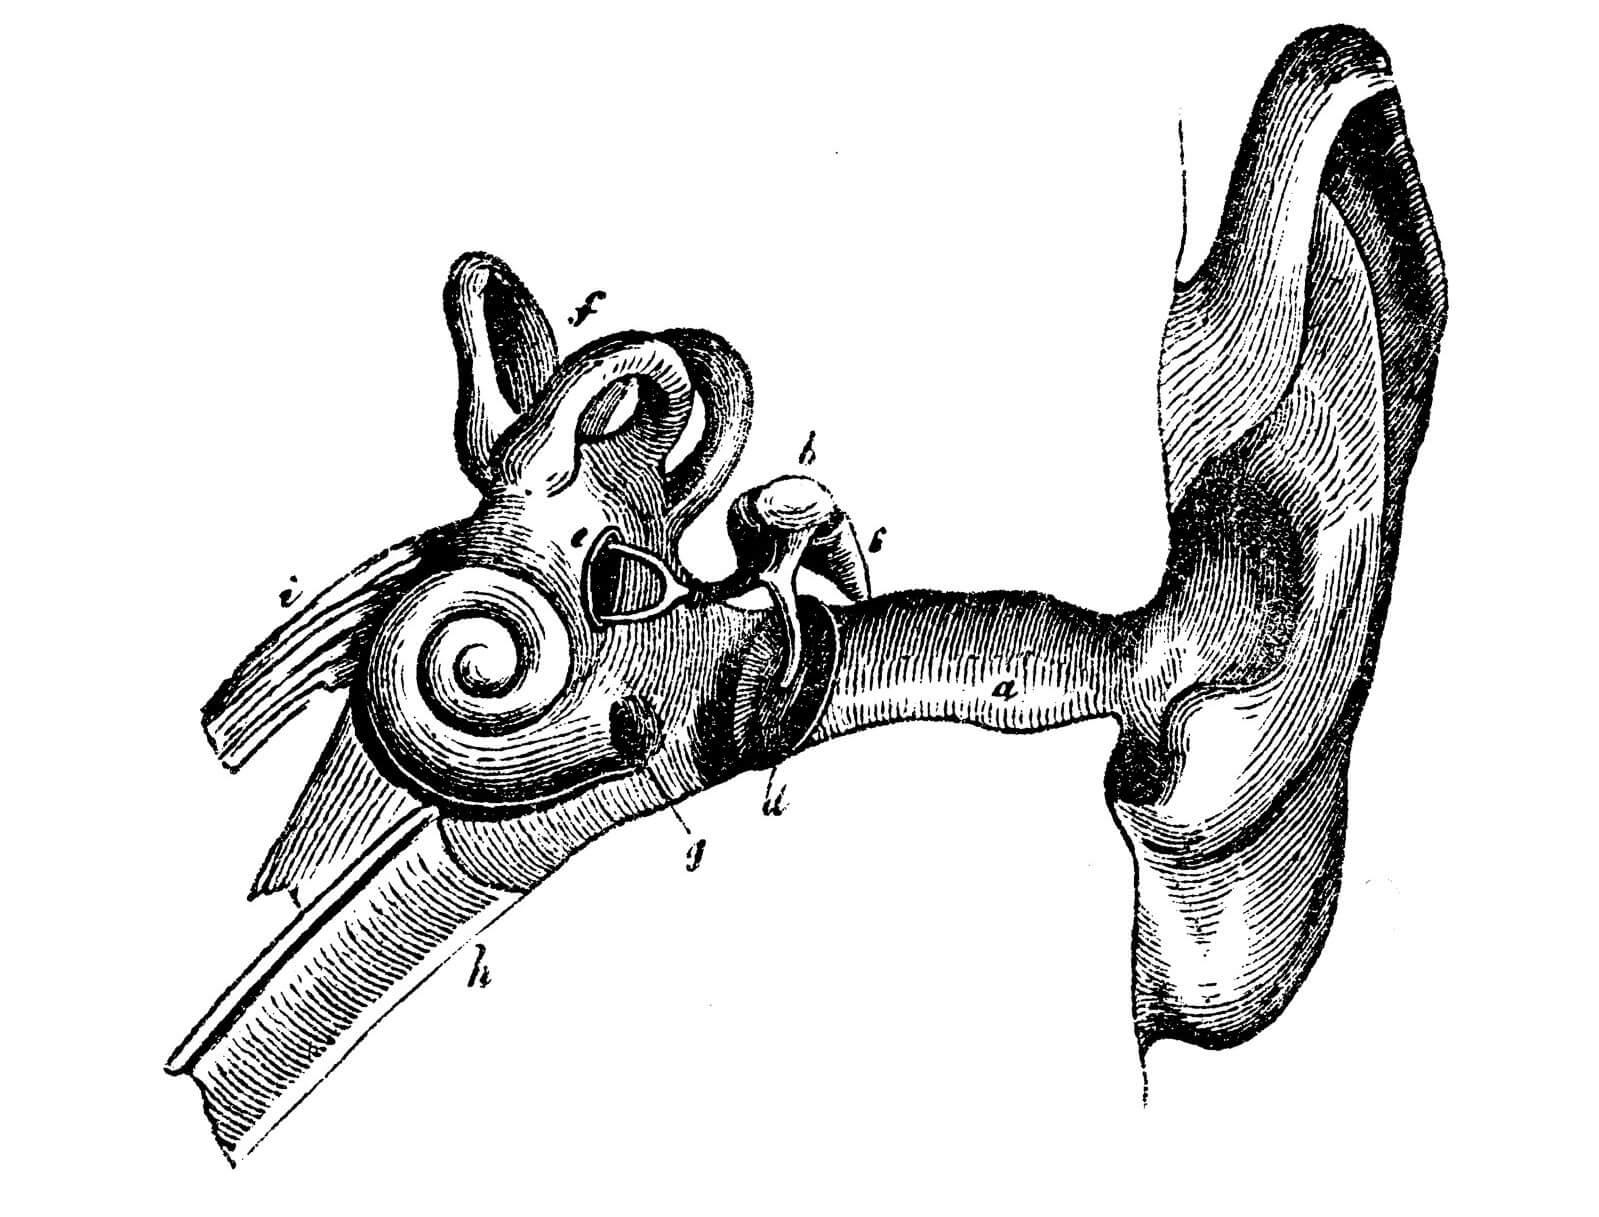 History of Hearing Loss Treatment